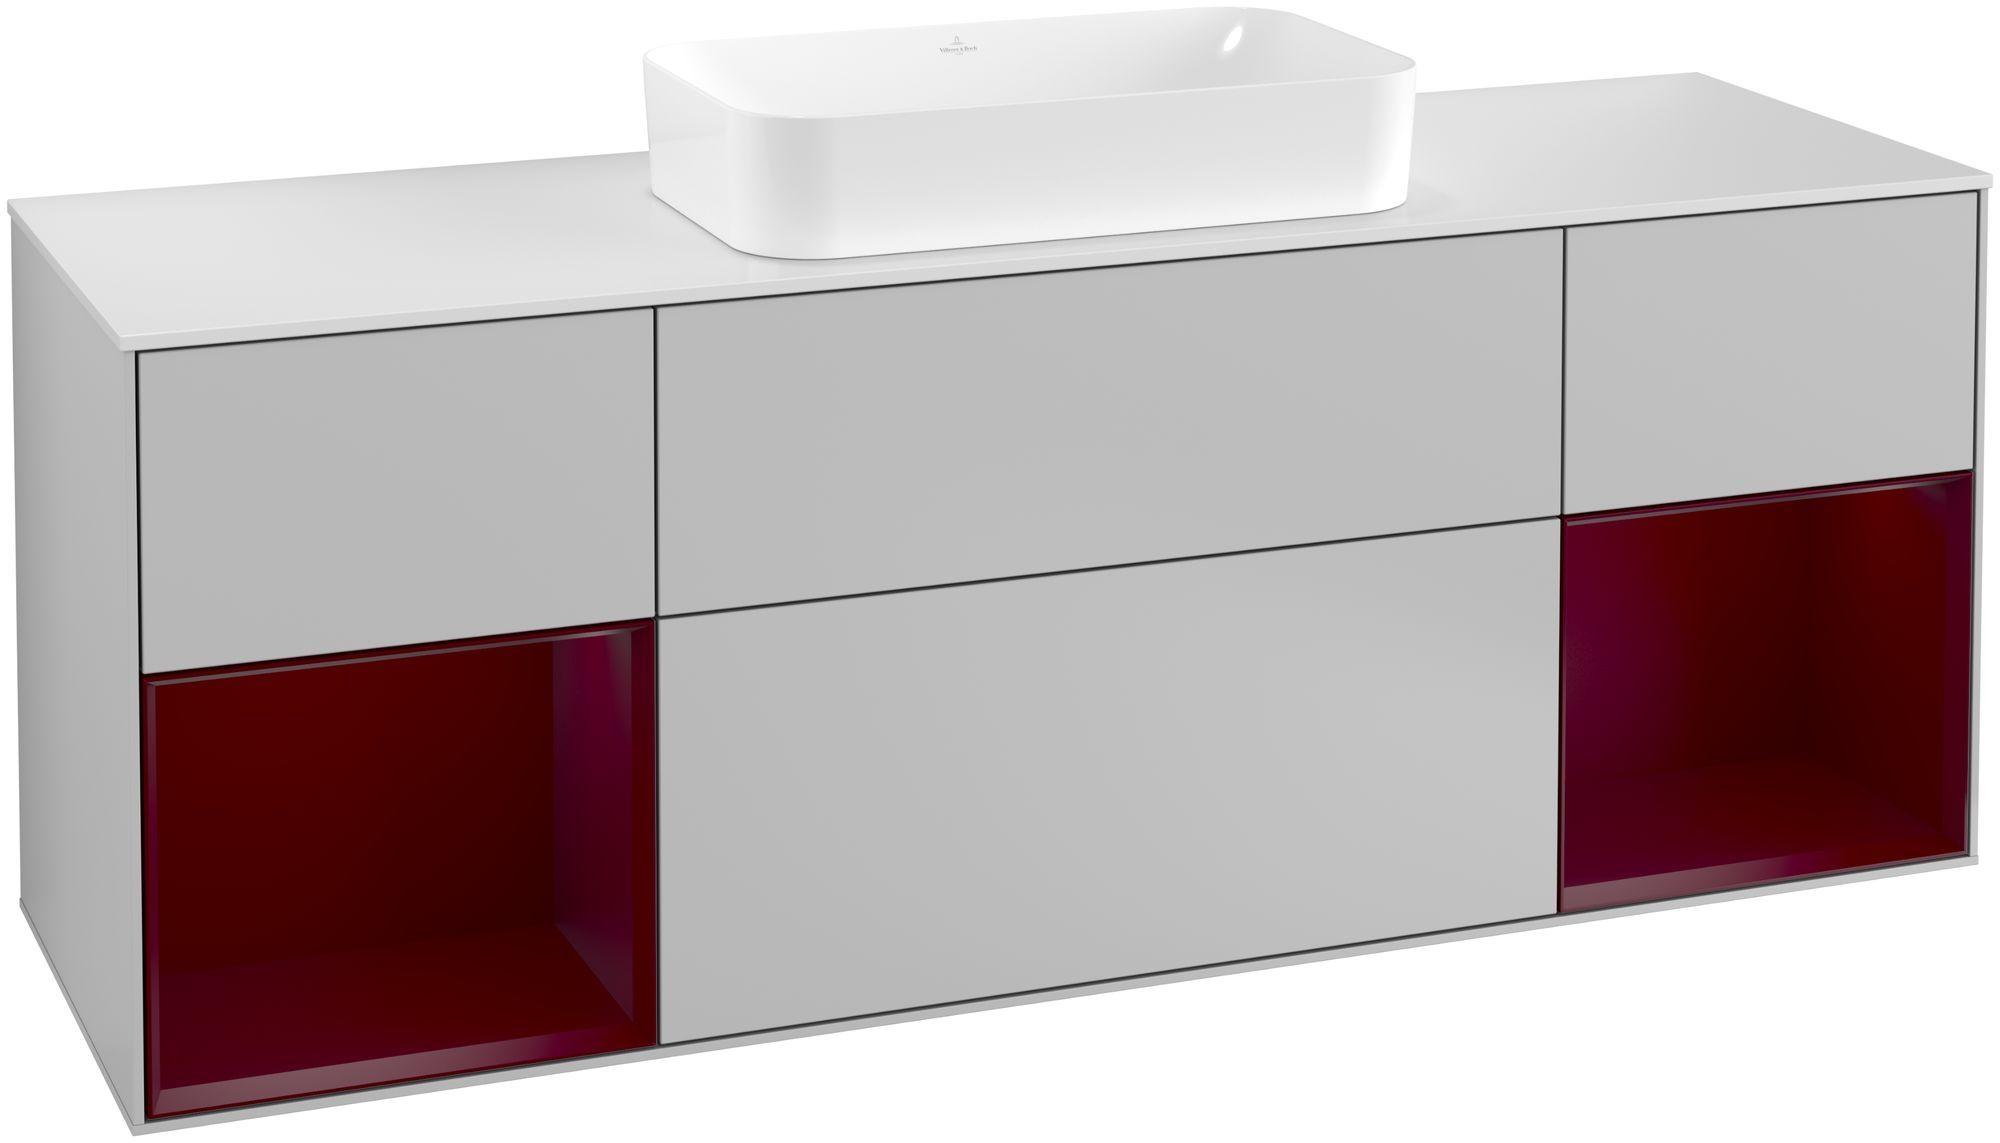 Villeroy & Boch Finion G33 Waschtischunterschrank mit Regalelement 4 Auszüge Waschtisch mittig LED-Beleuchtung B:160xH:60,3xT:50,1cm Front, Korpus: Light Grey Matt, Regal: Peony, Glasplatte: White Matt G331HBGJ